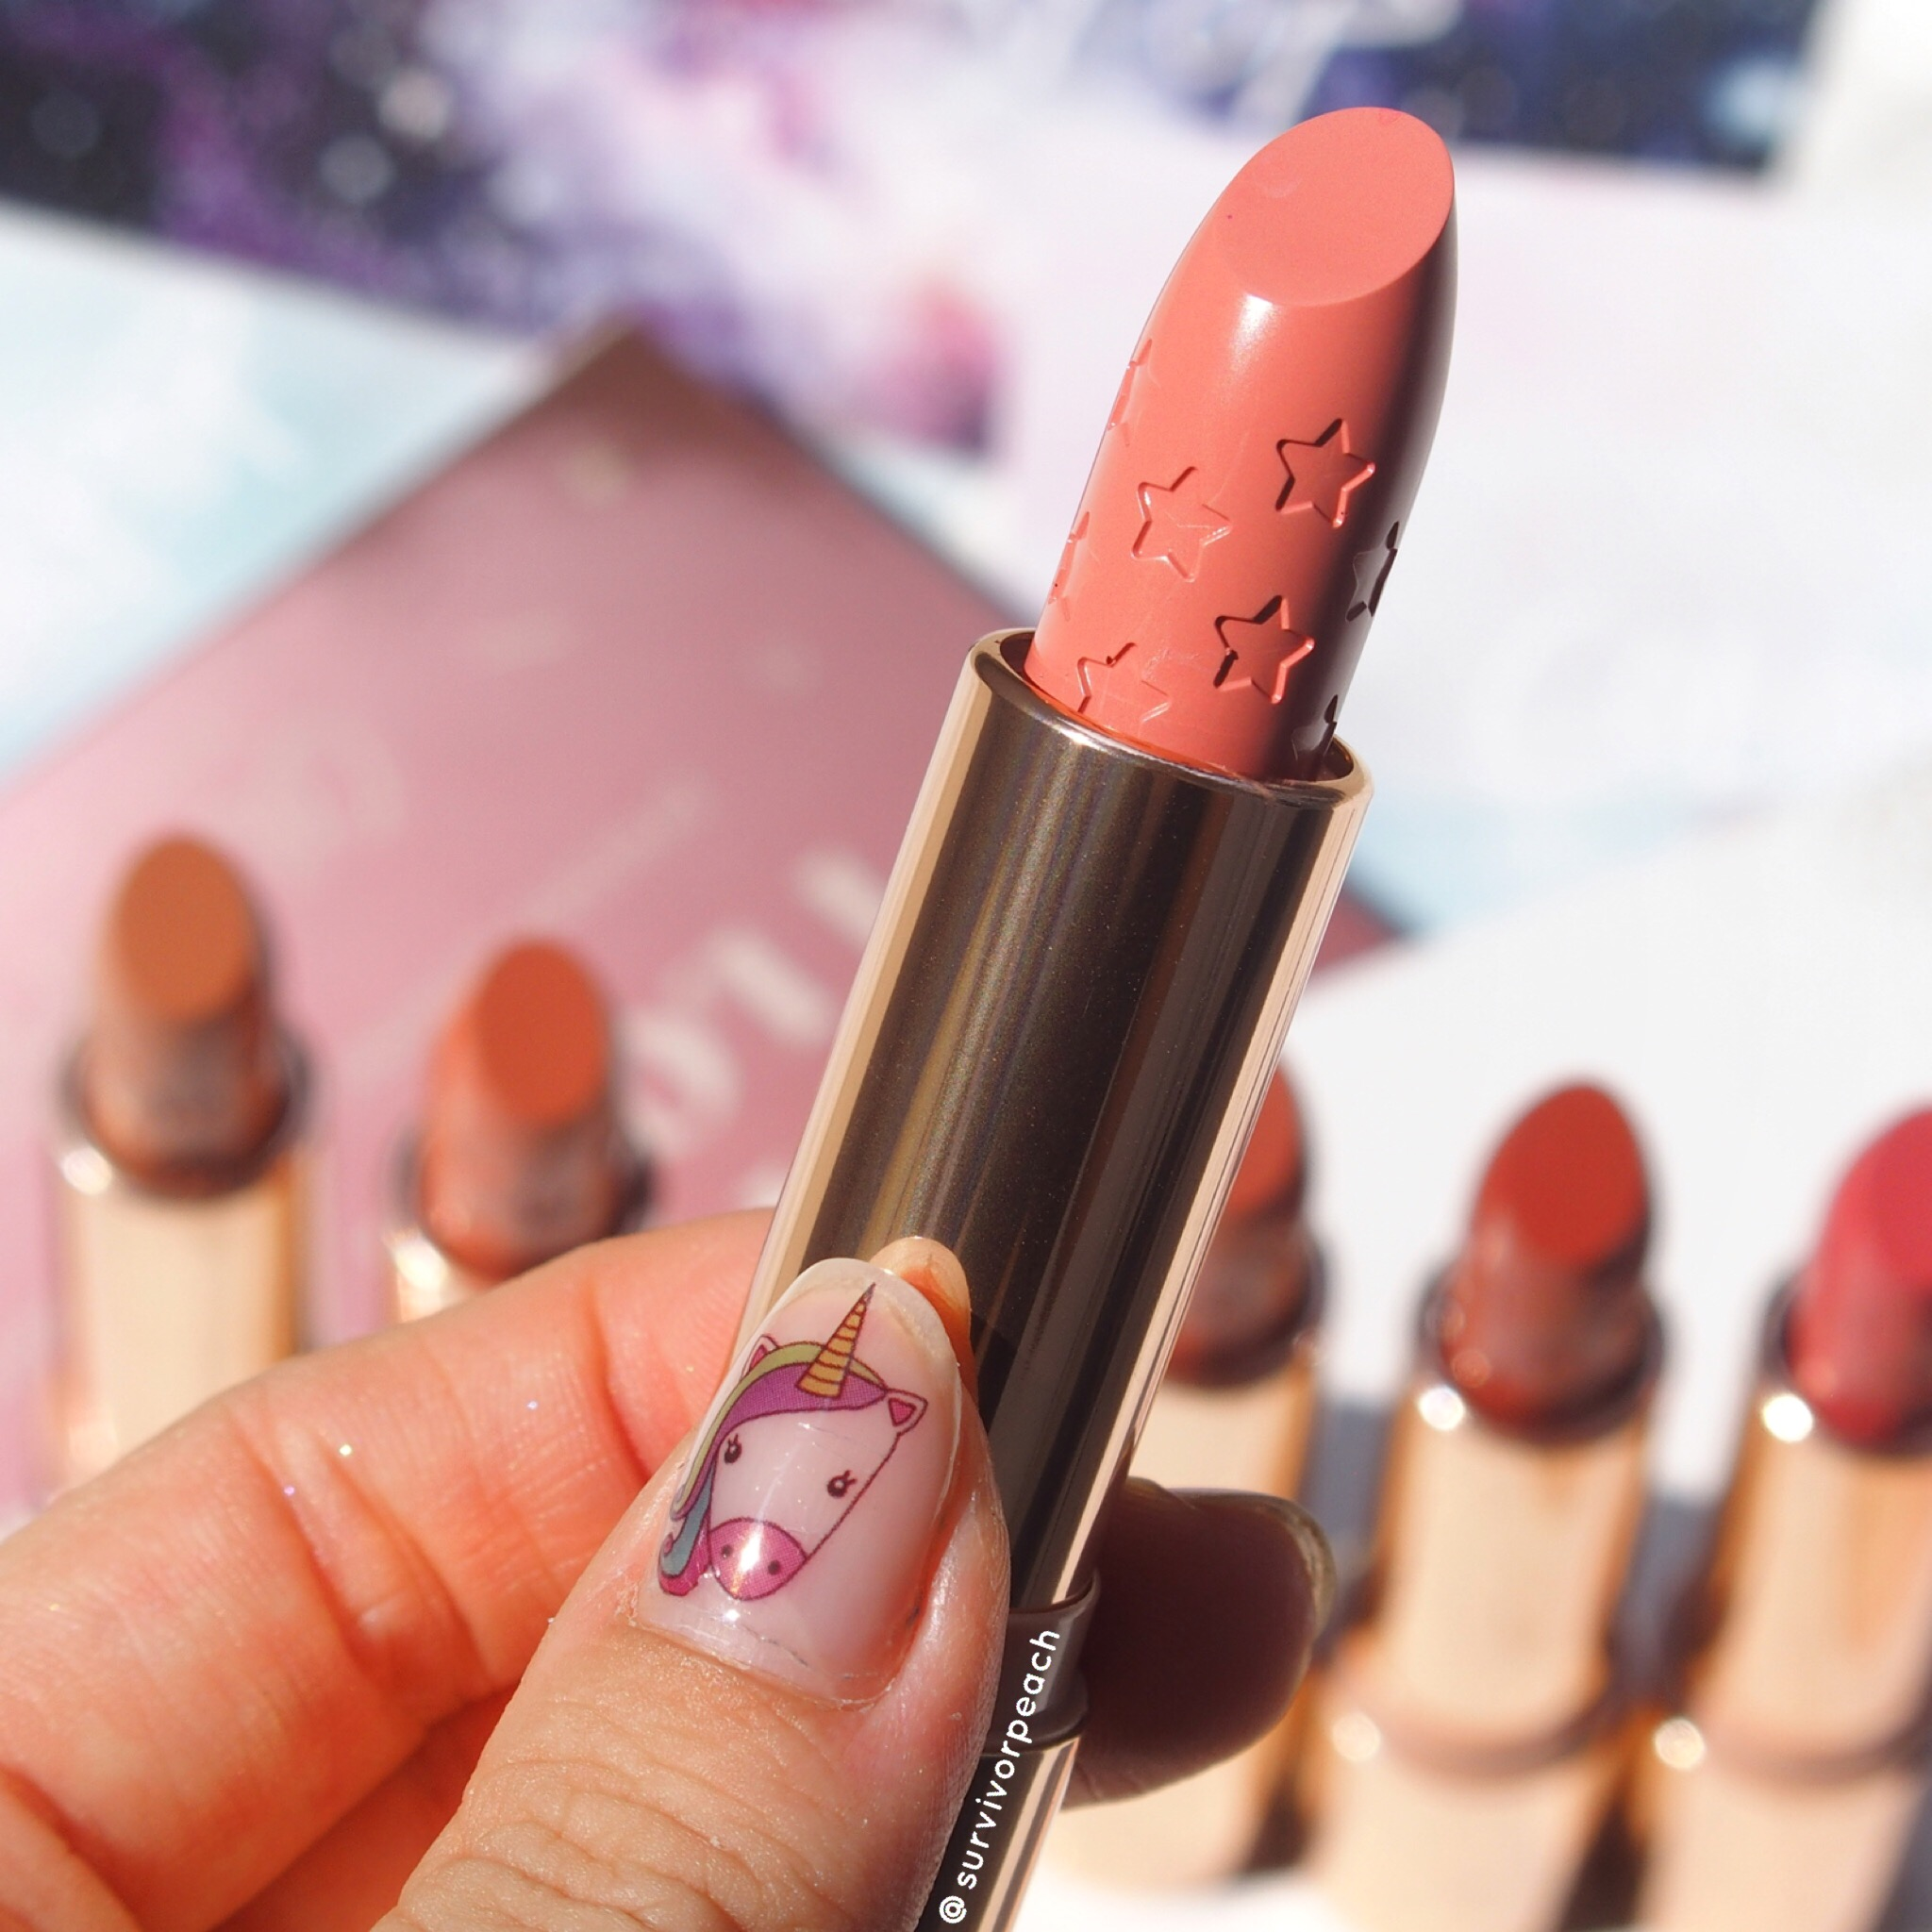 Colourpop Lux Lipsticks Stone Fox